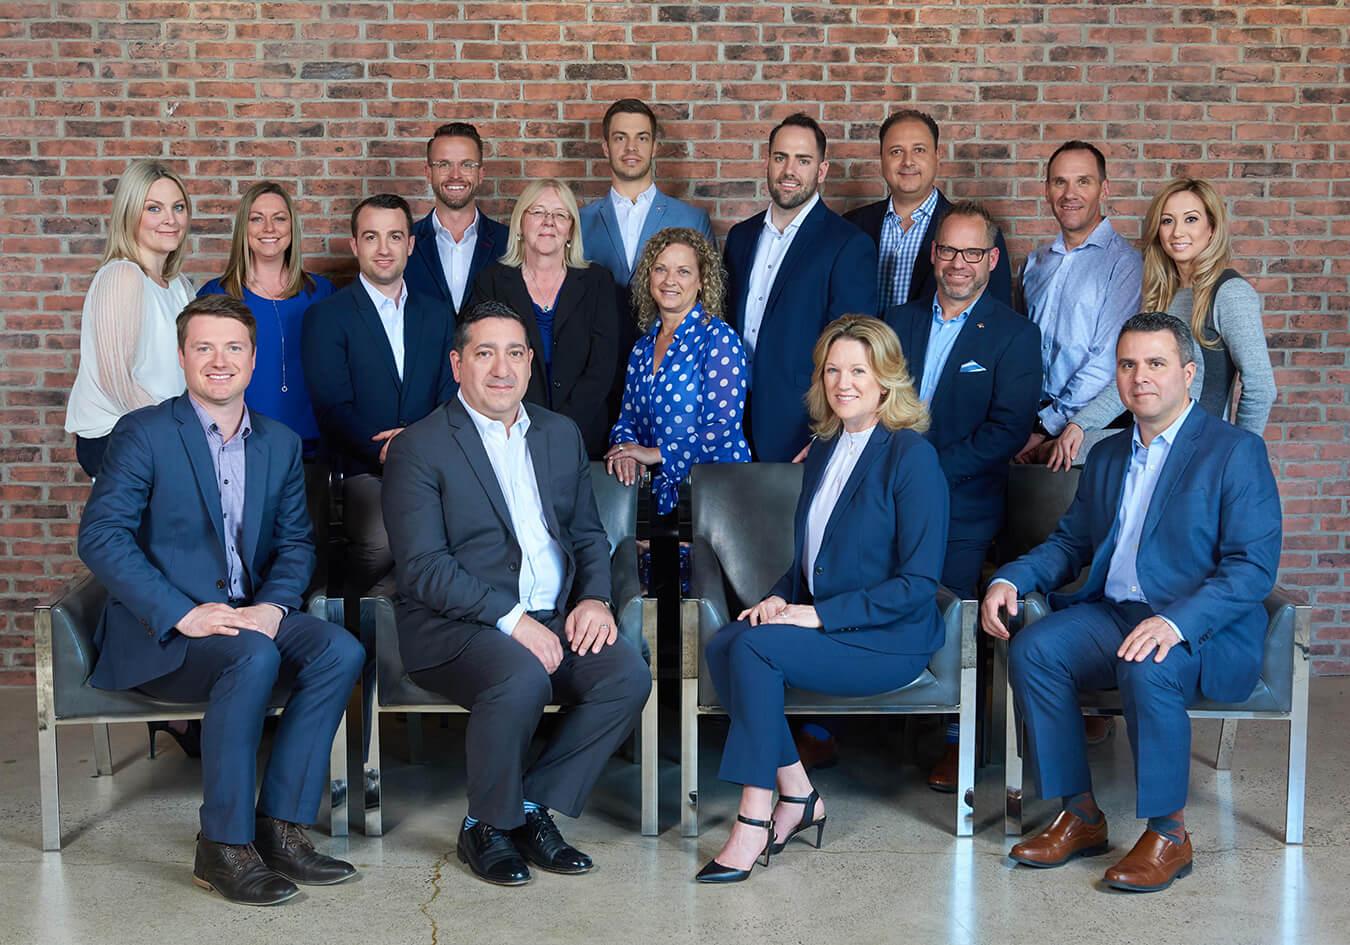 Ontario's team